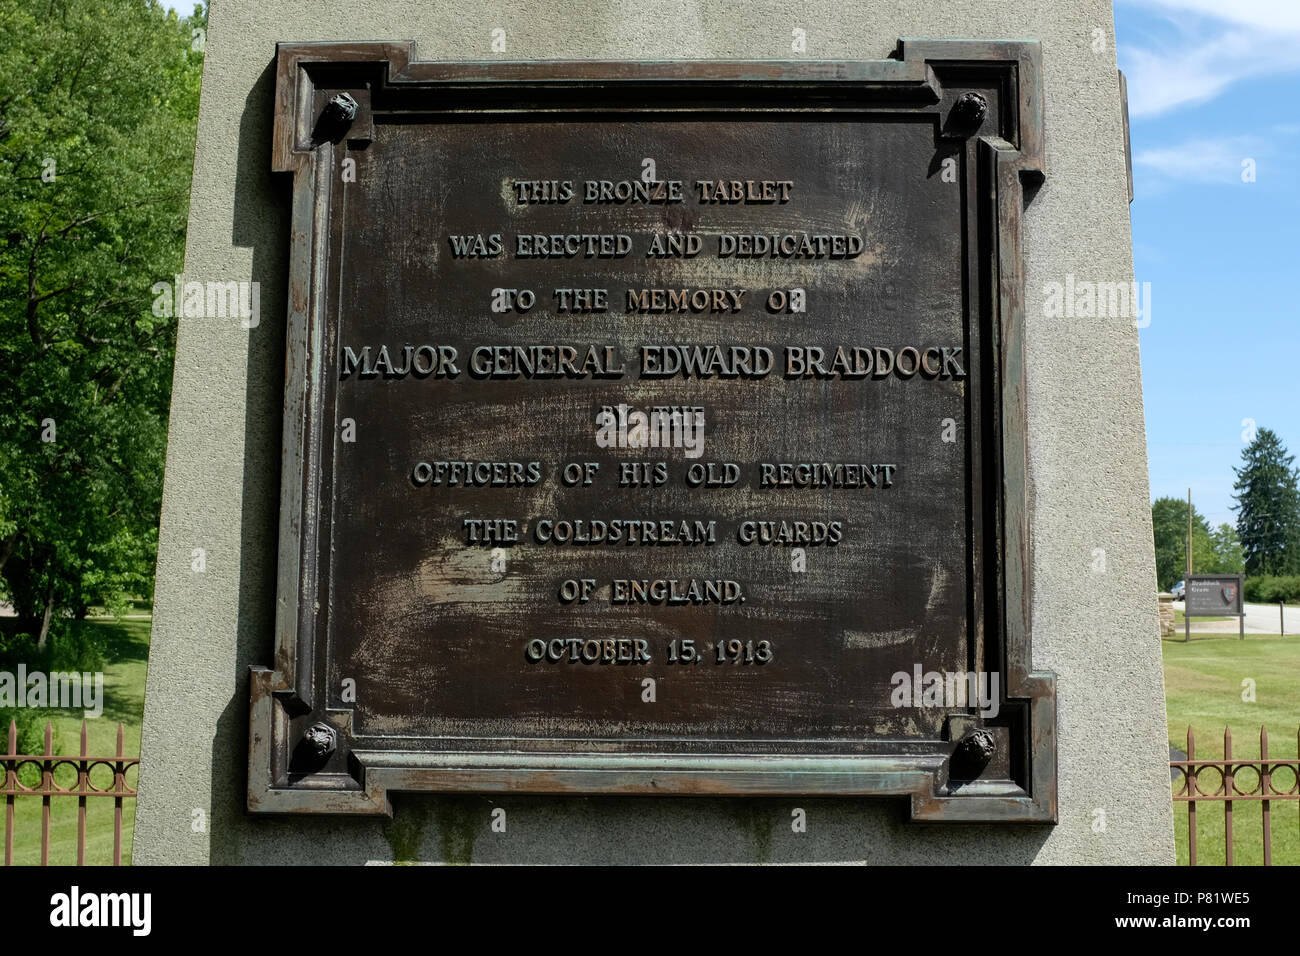 Plaque on Grave of Major General Edward Braddock in Farmington, Pennsylvania - Stock Image